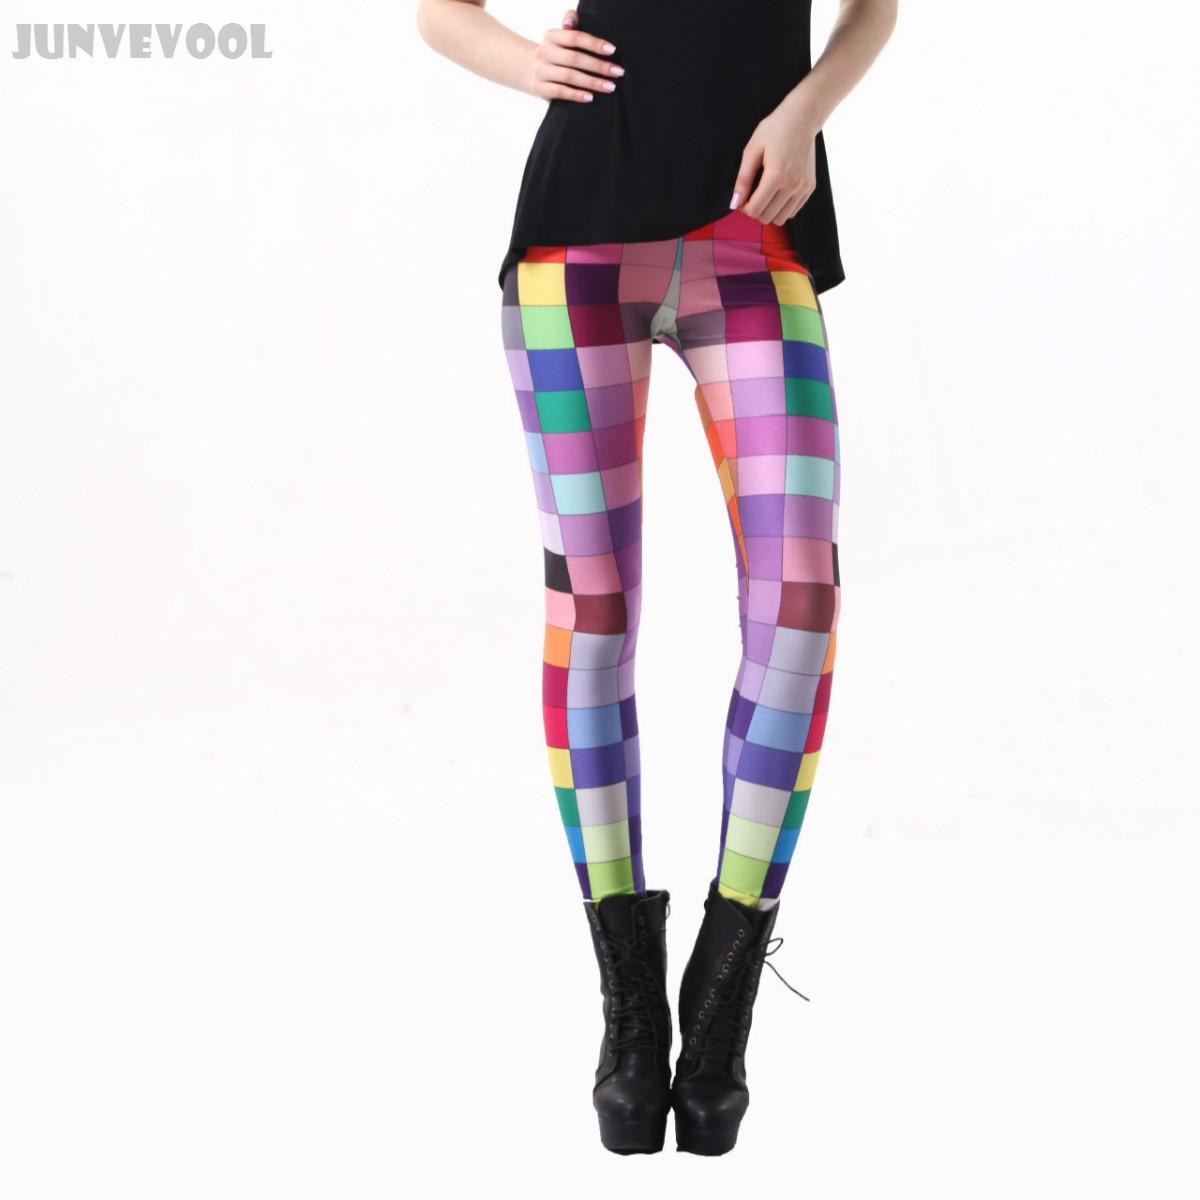 511590925634d Detail Feedback Questions about Lycra Spandex Leggings Slim Nice Pants  Women Rainbow Color Lattice Printed Grid Skinny Trousers Stretchy Pencil  Slim Slacks ...